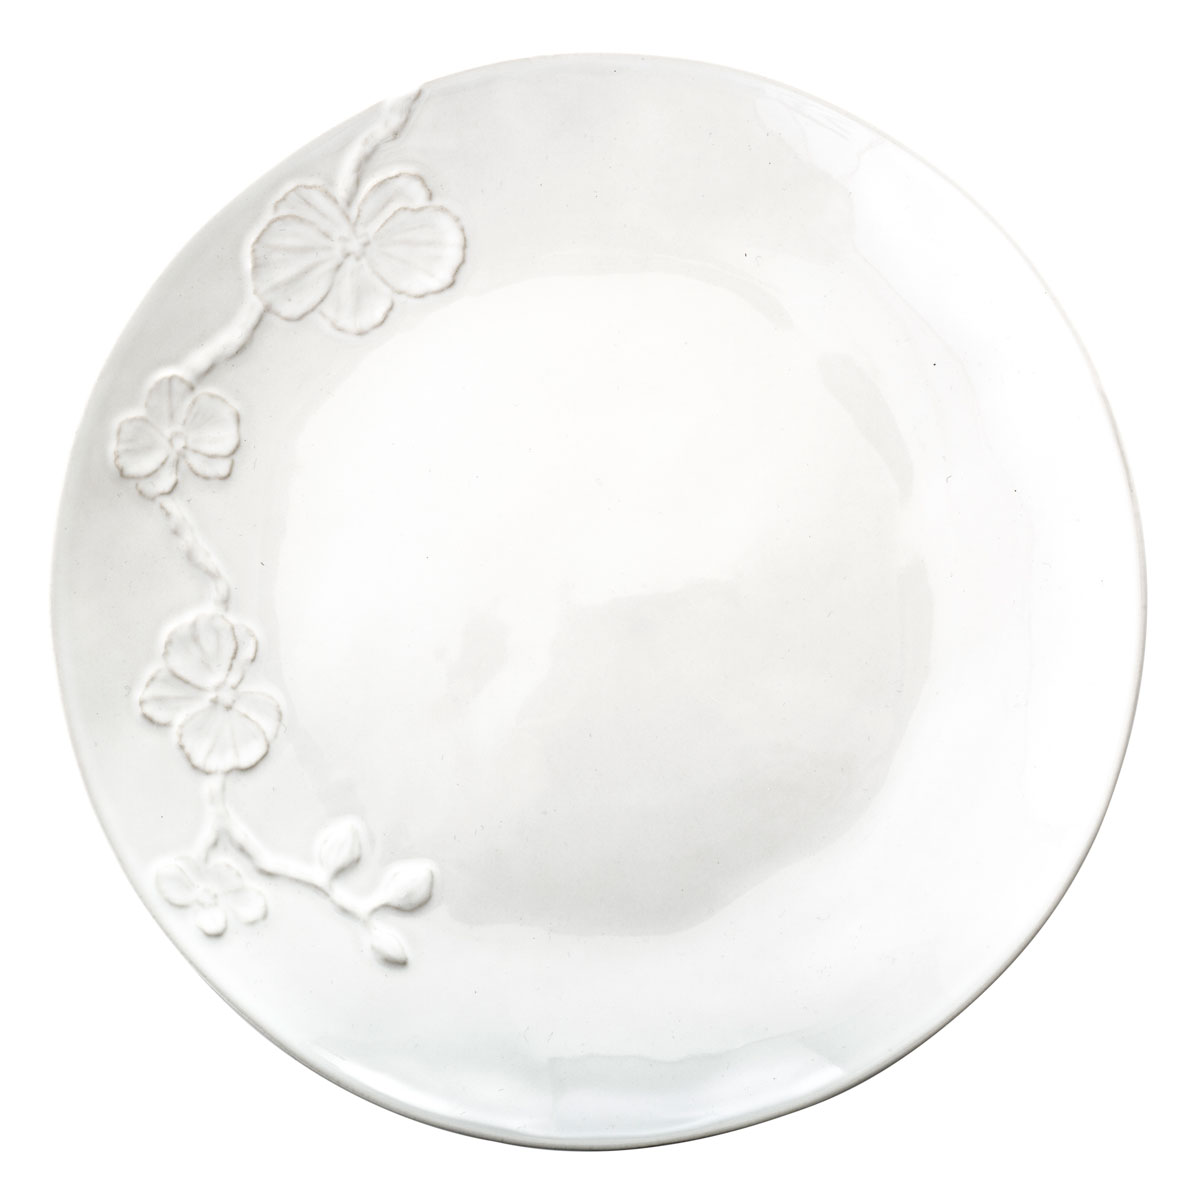 Michael Aram White Orchid Stoneware Dinner Plate, Single